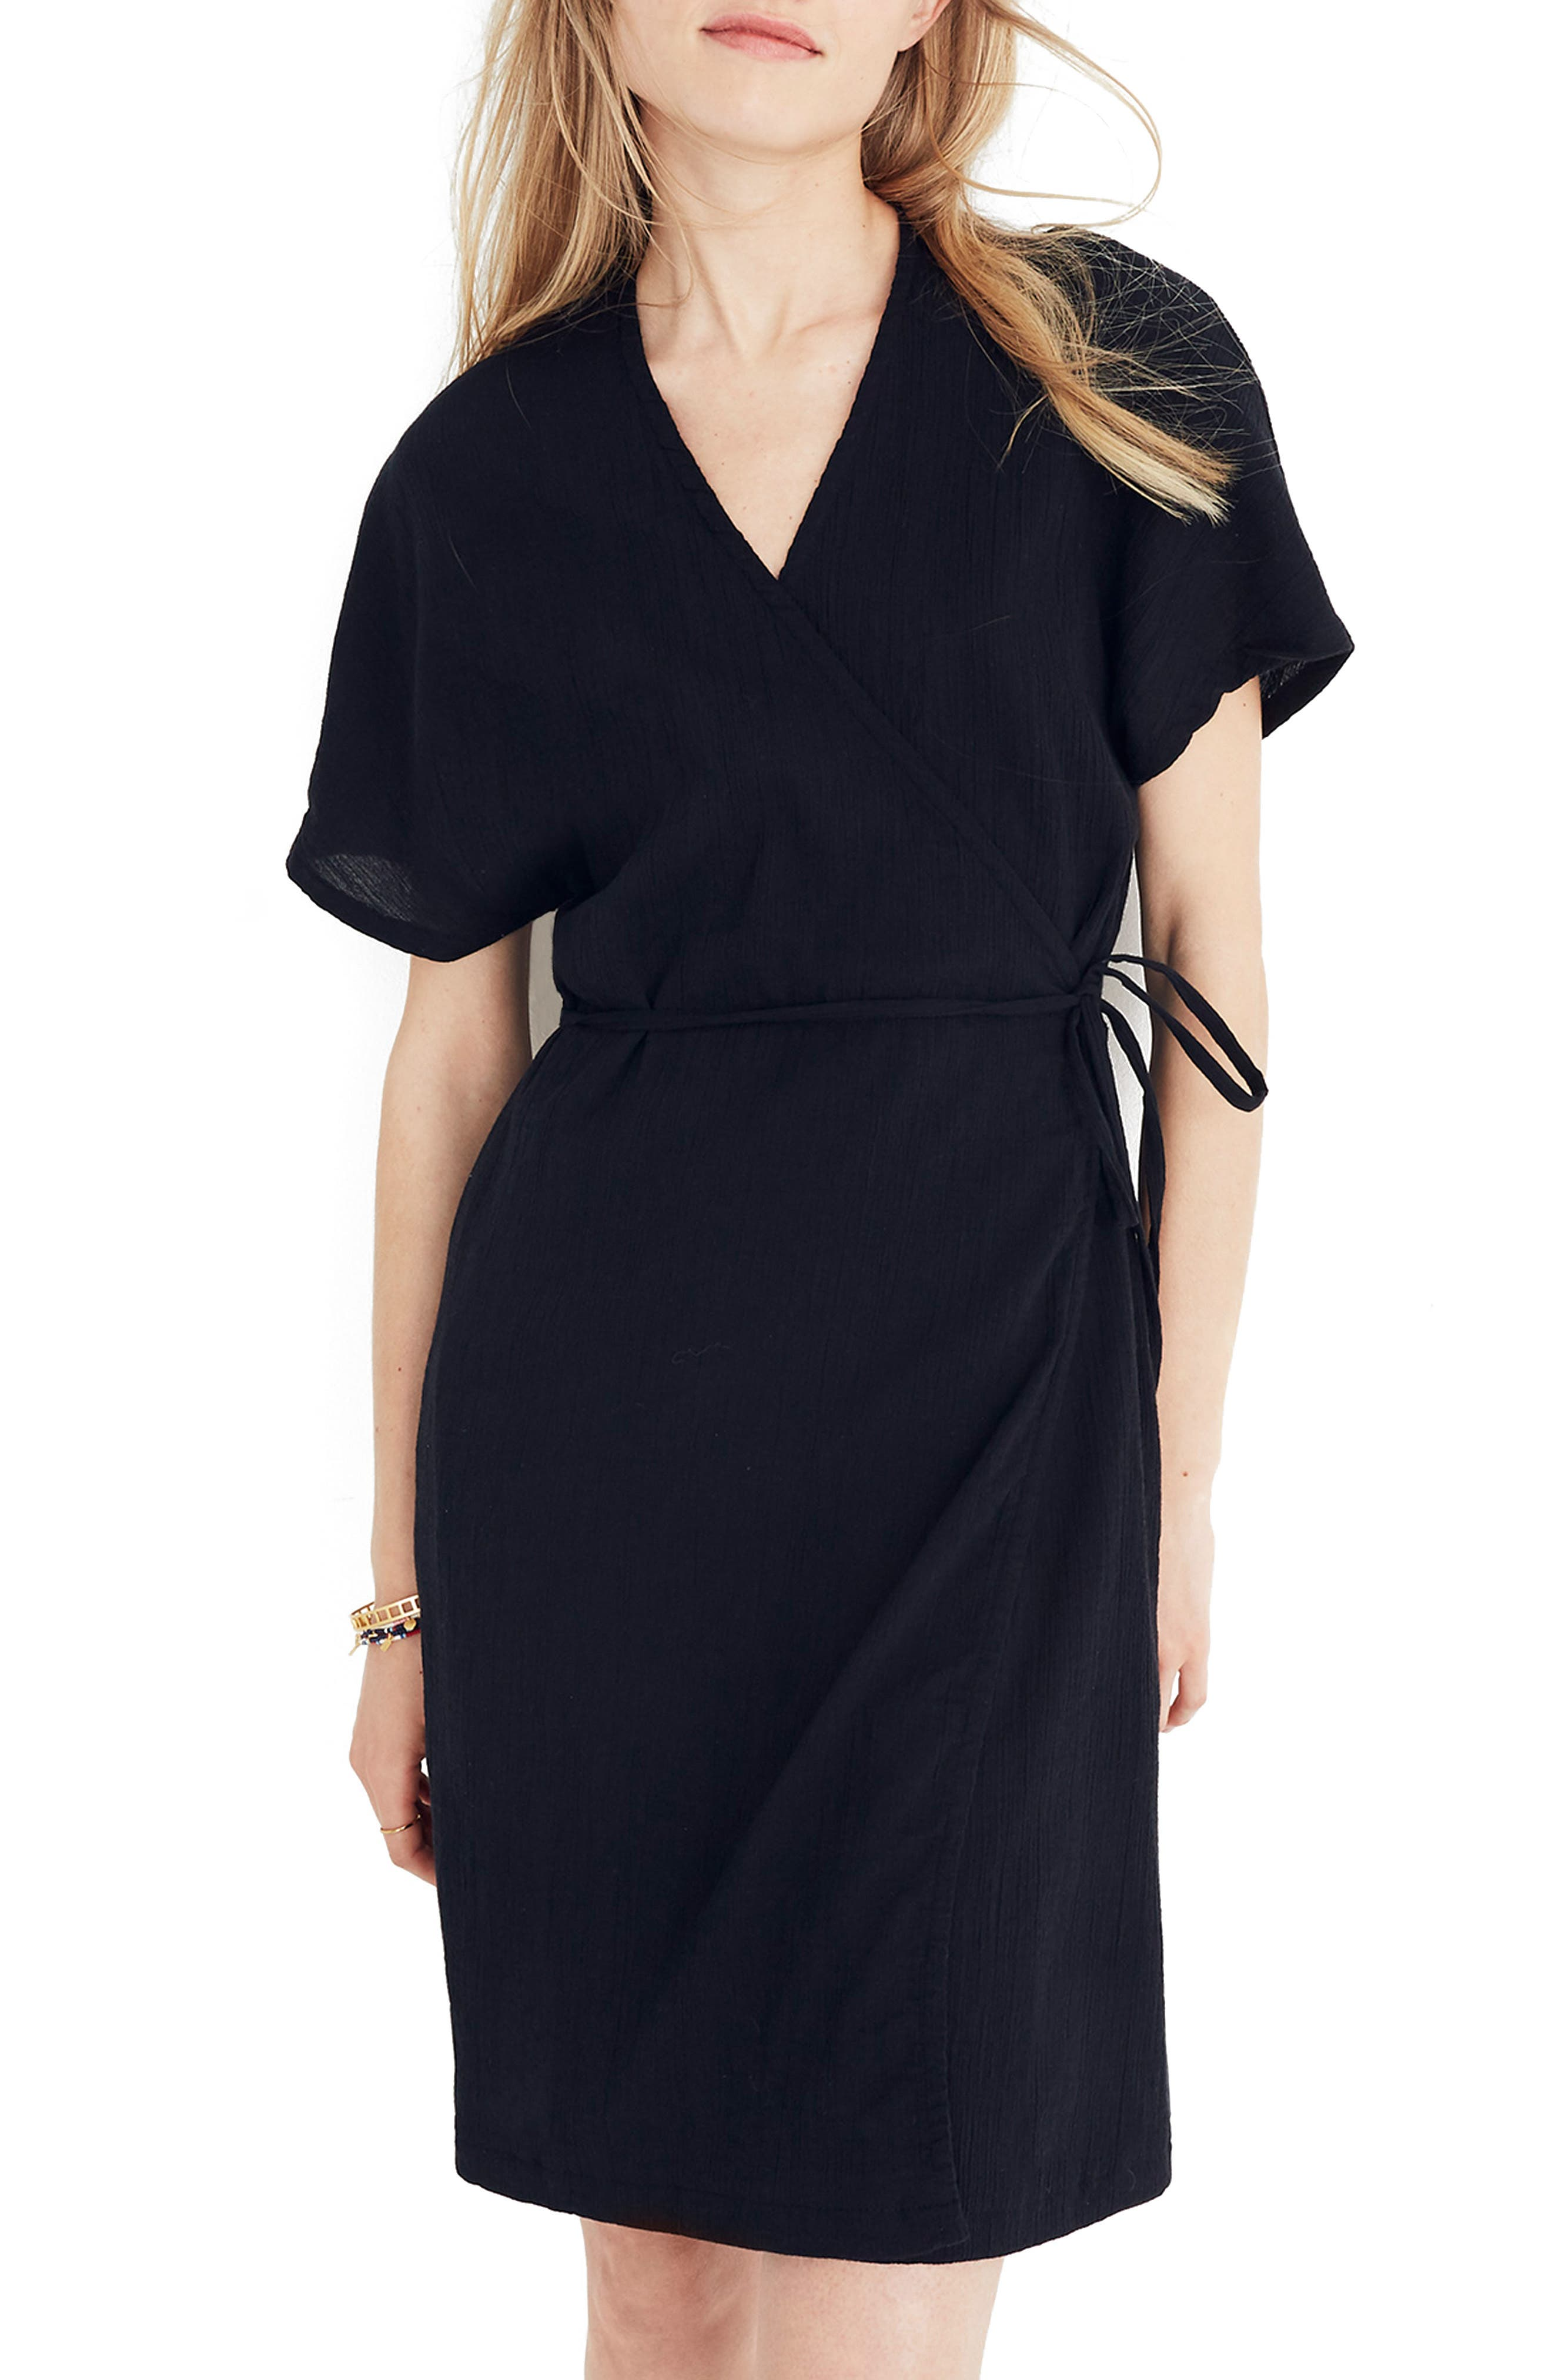 floaty cut-out back dress - Black N ijixlSmv